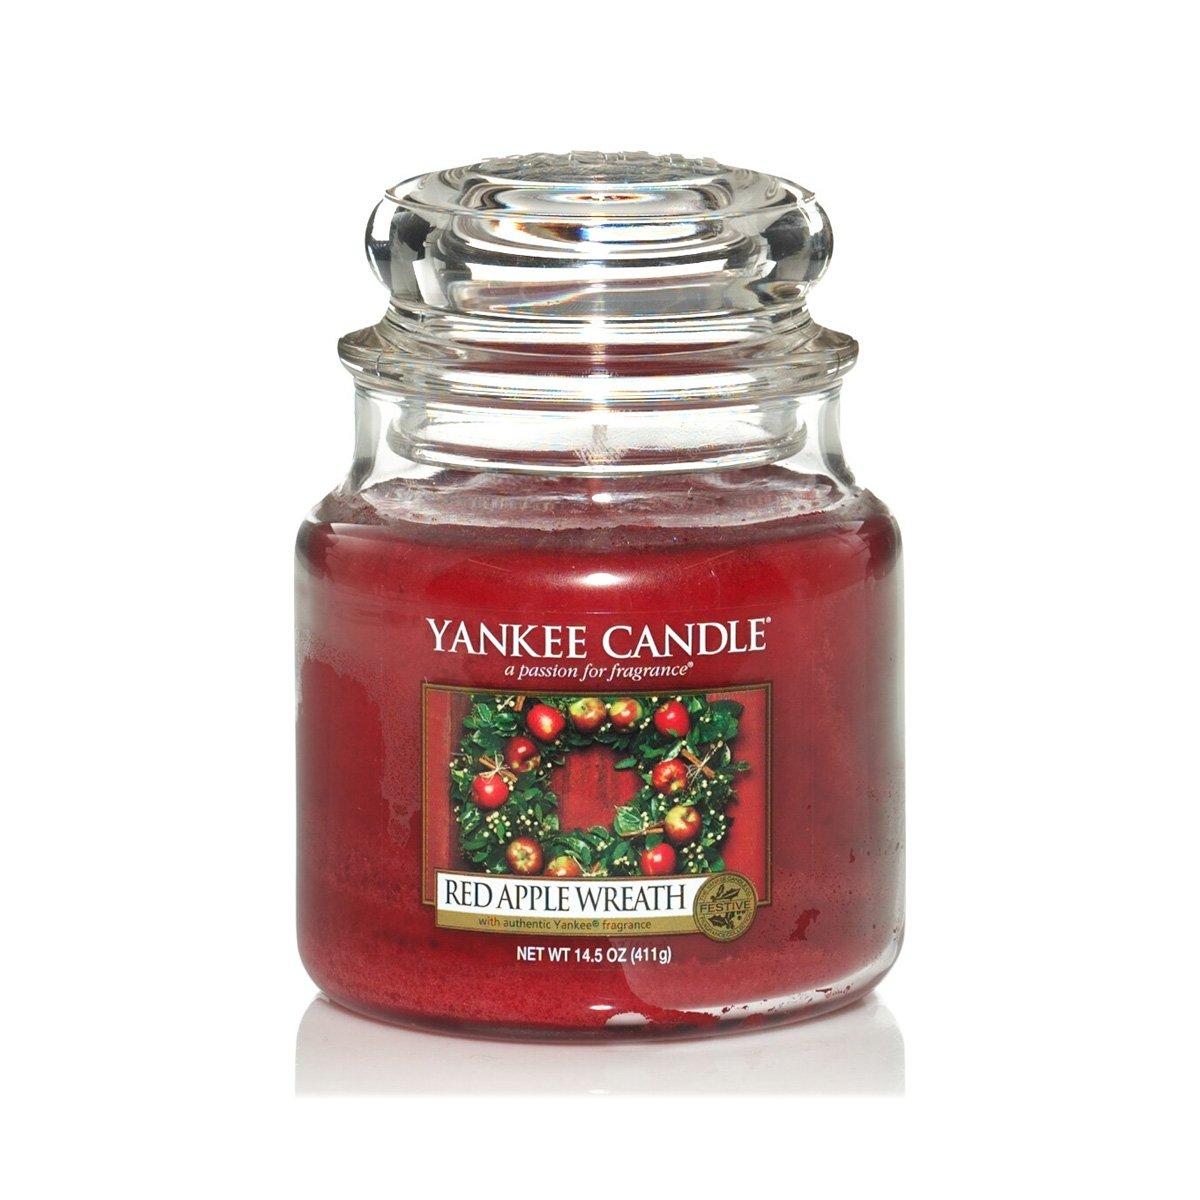 Yankee Candle Glaskerze, klein, Red Apple Wreath 1120699E